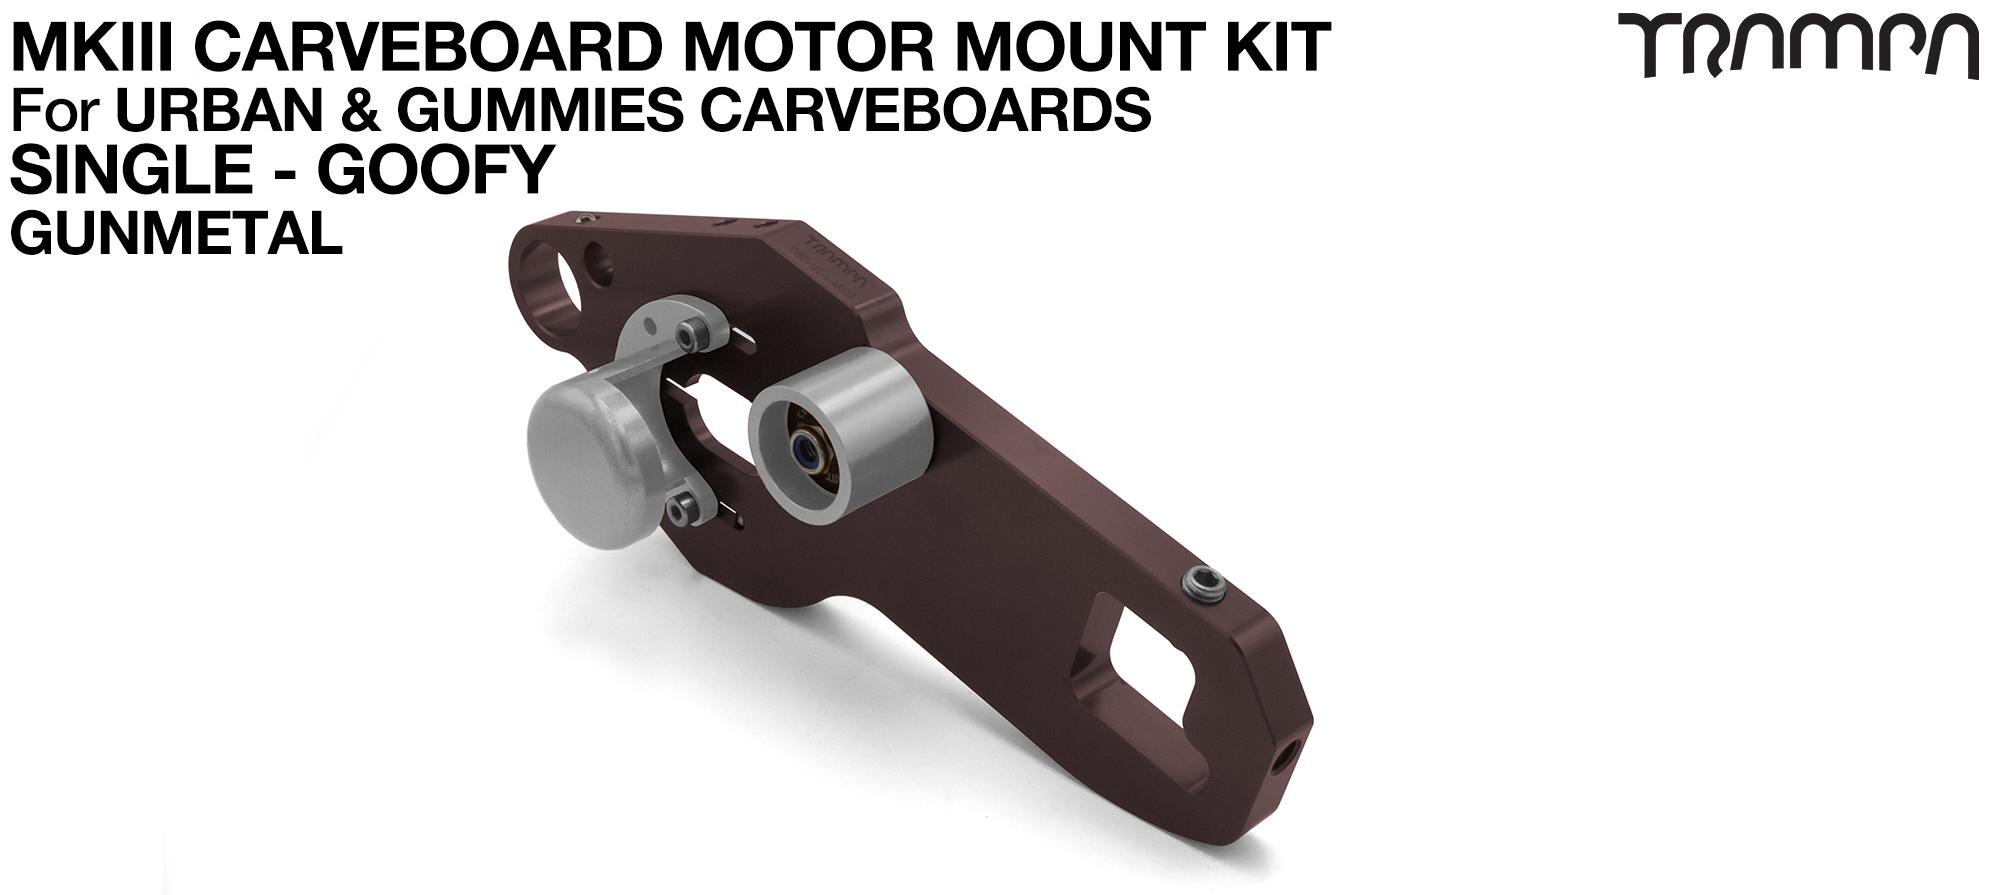 MkIII CARVE BOARD Motor Mount Kit - SINGLE GUNMETAL